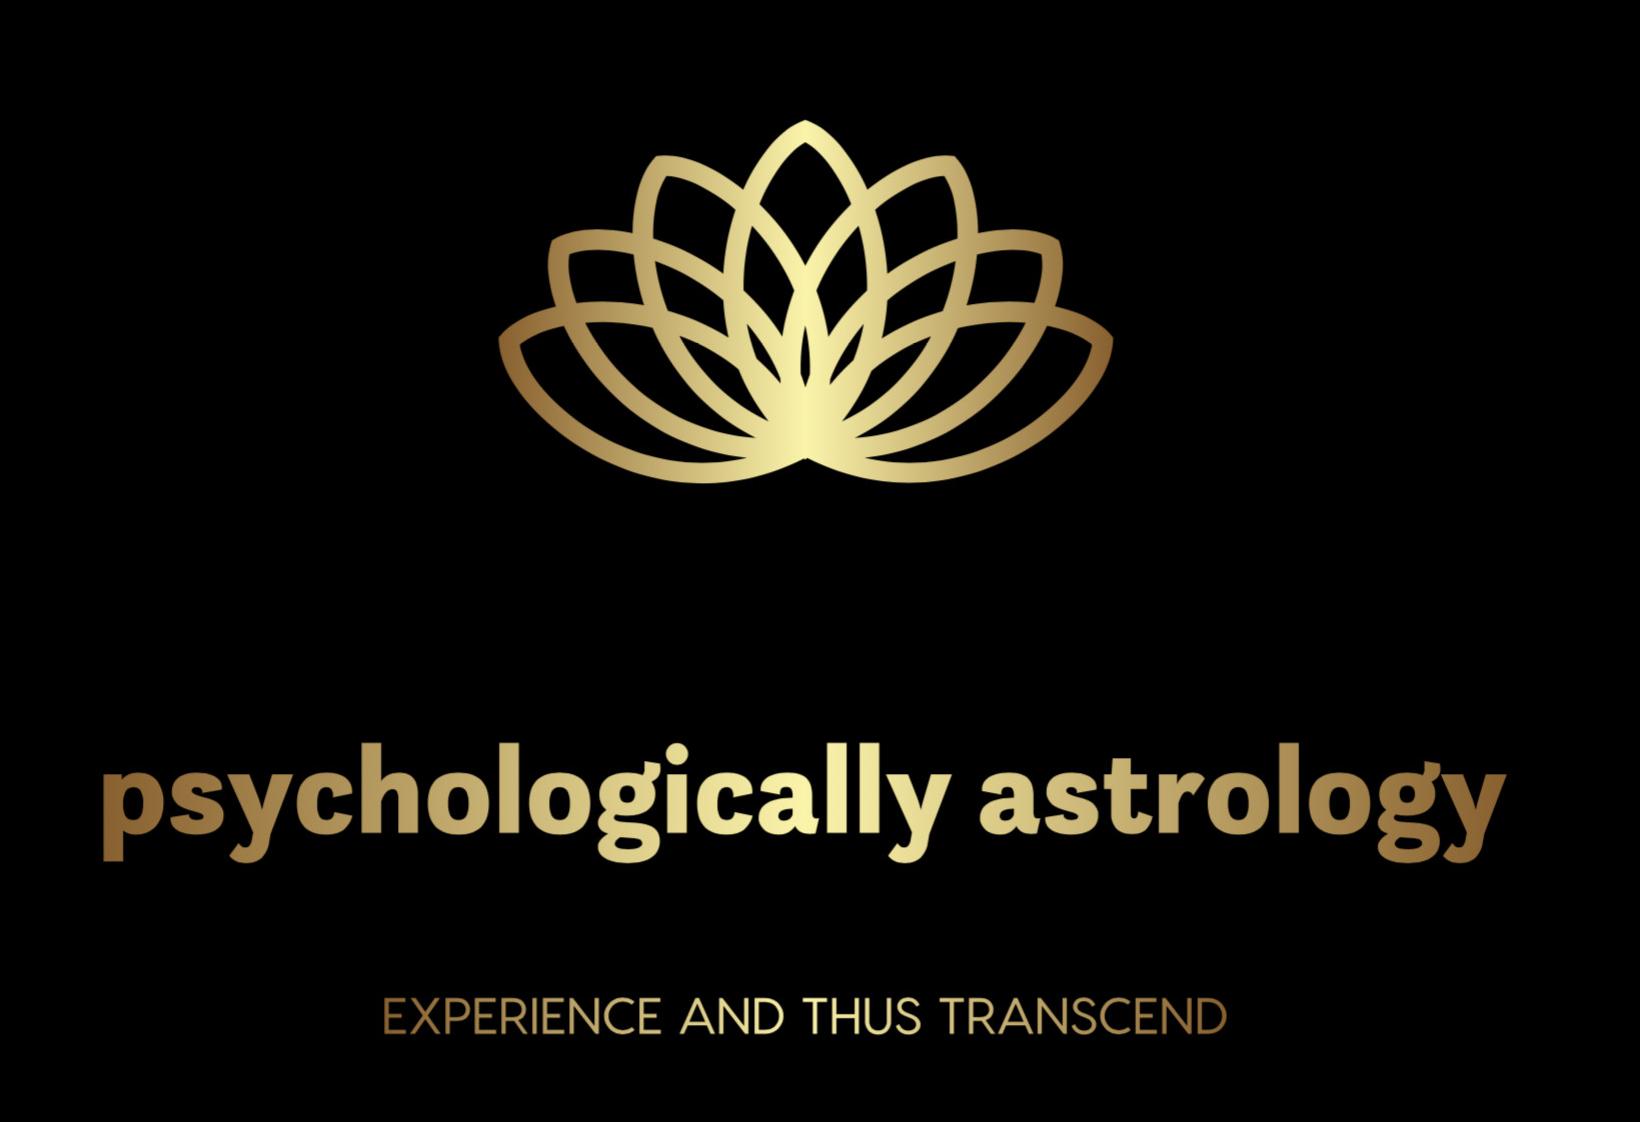 www.psychologicallyastrology.com